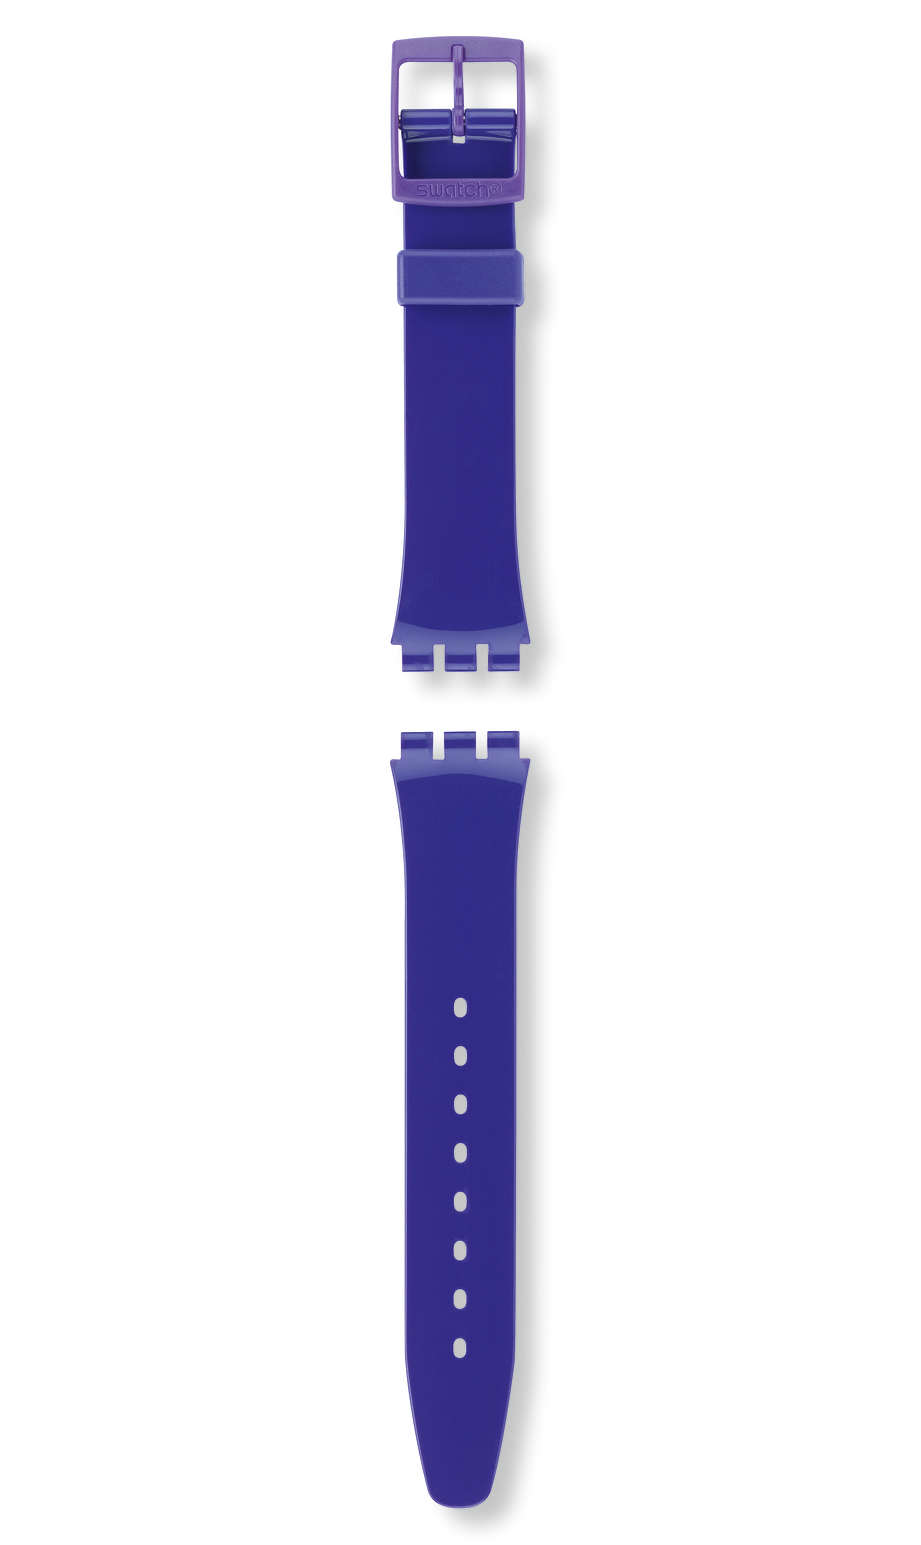 Swatch - CALLICARPA - 1